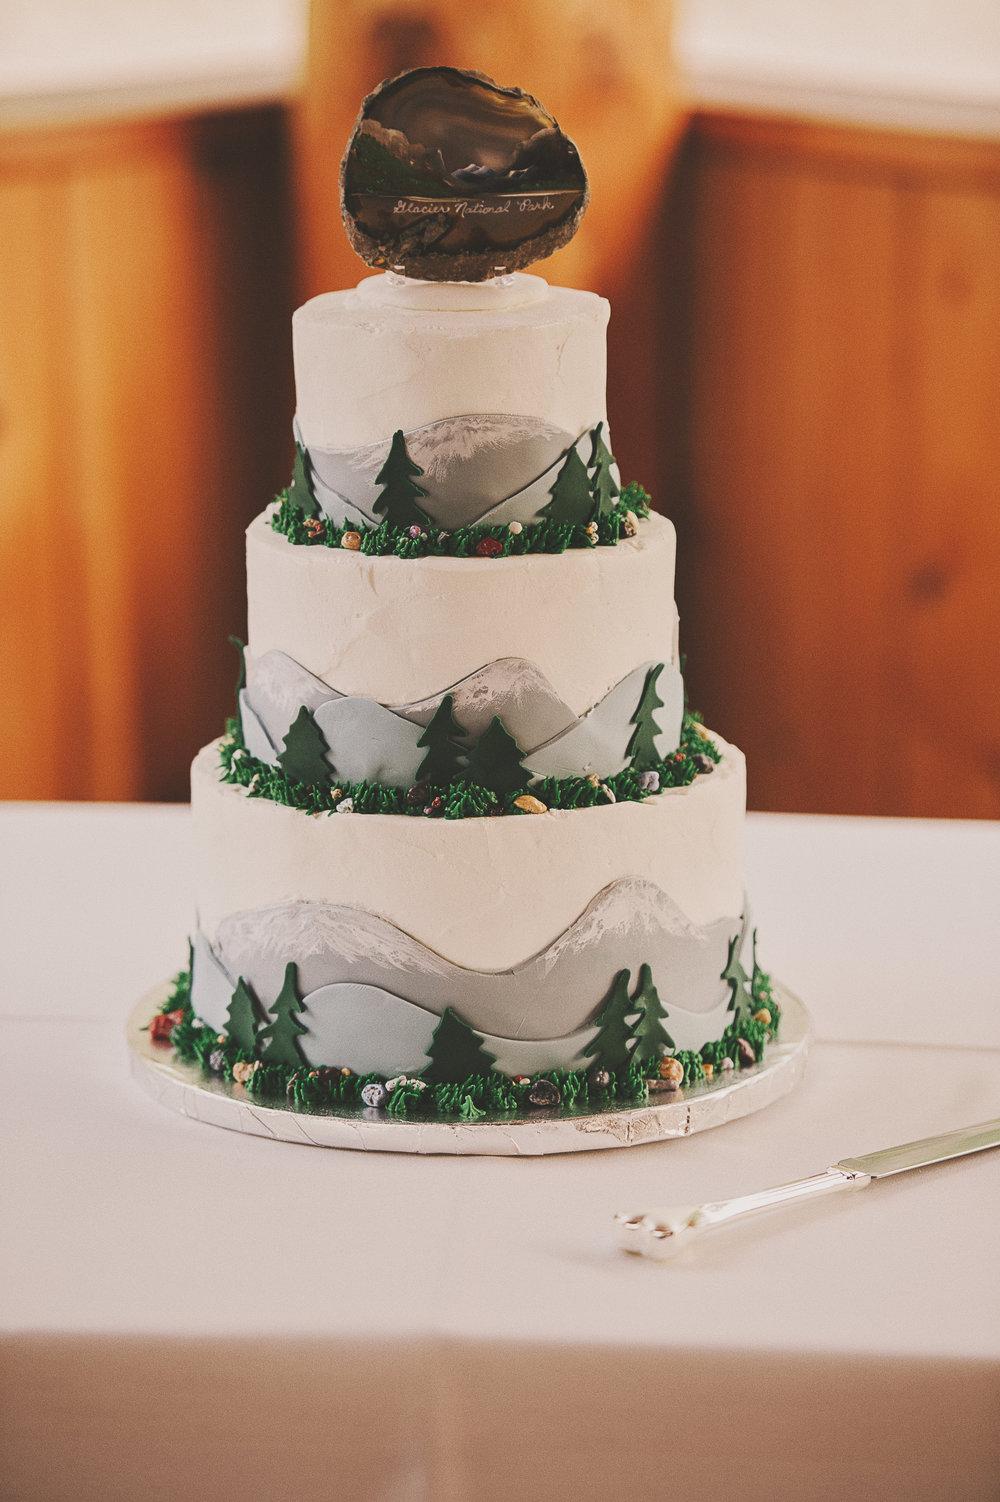 Glacier Montana Wedding_Elly Maurer + Frankie Dashiell Wedding_Beautiful Outdoor Wedding_Kelsey Lane Photography-5359-2 copy.jpg